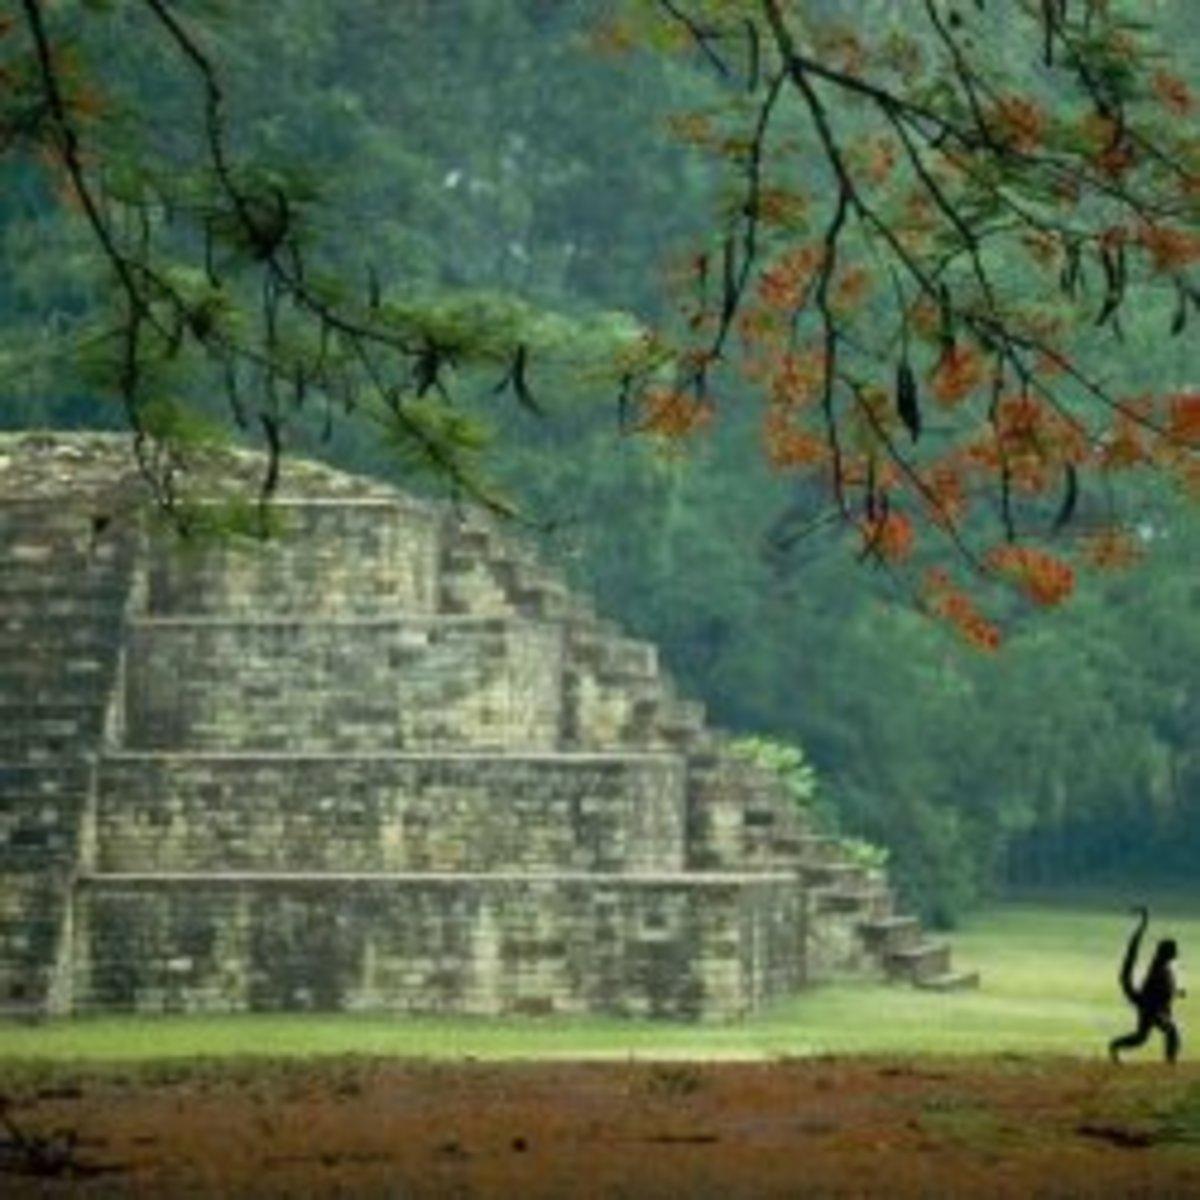 Honduras: Mayans, Weaving, & Plantains